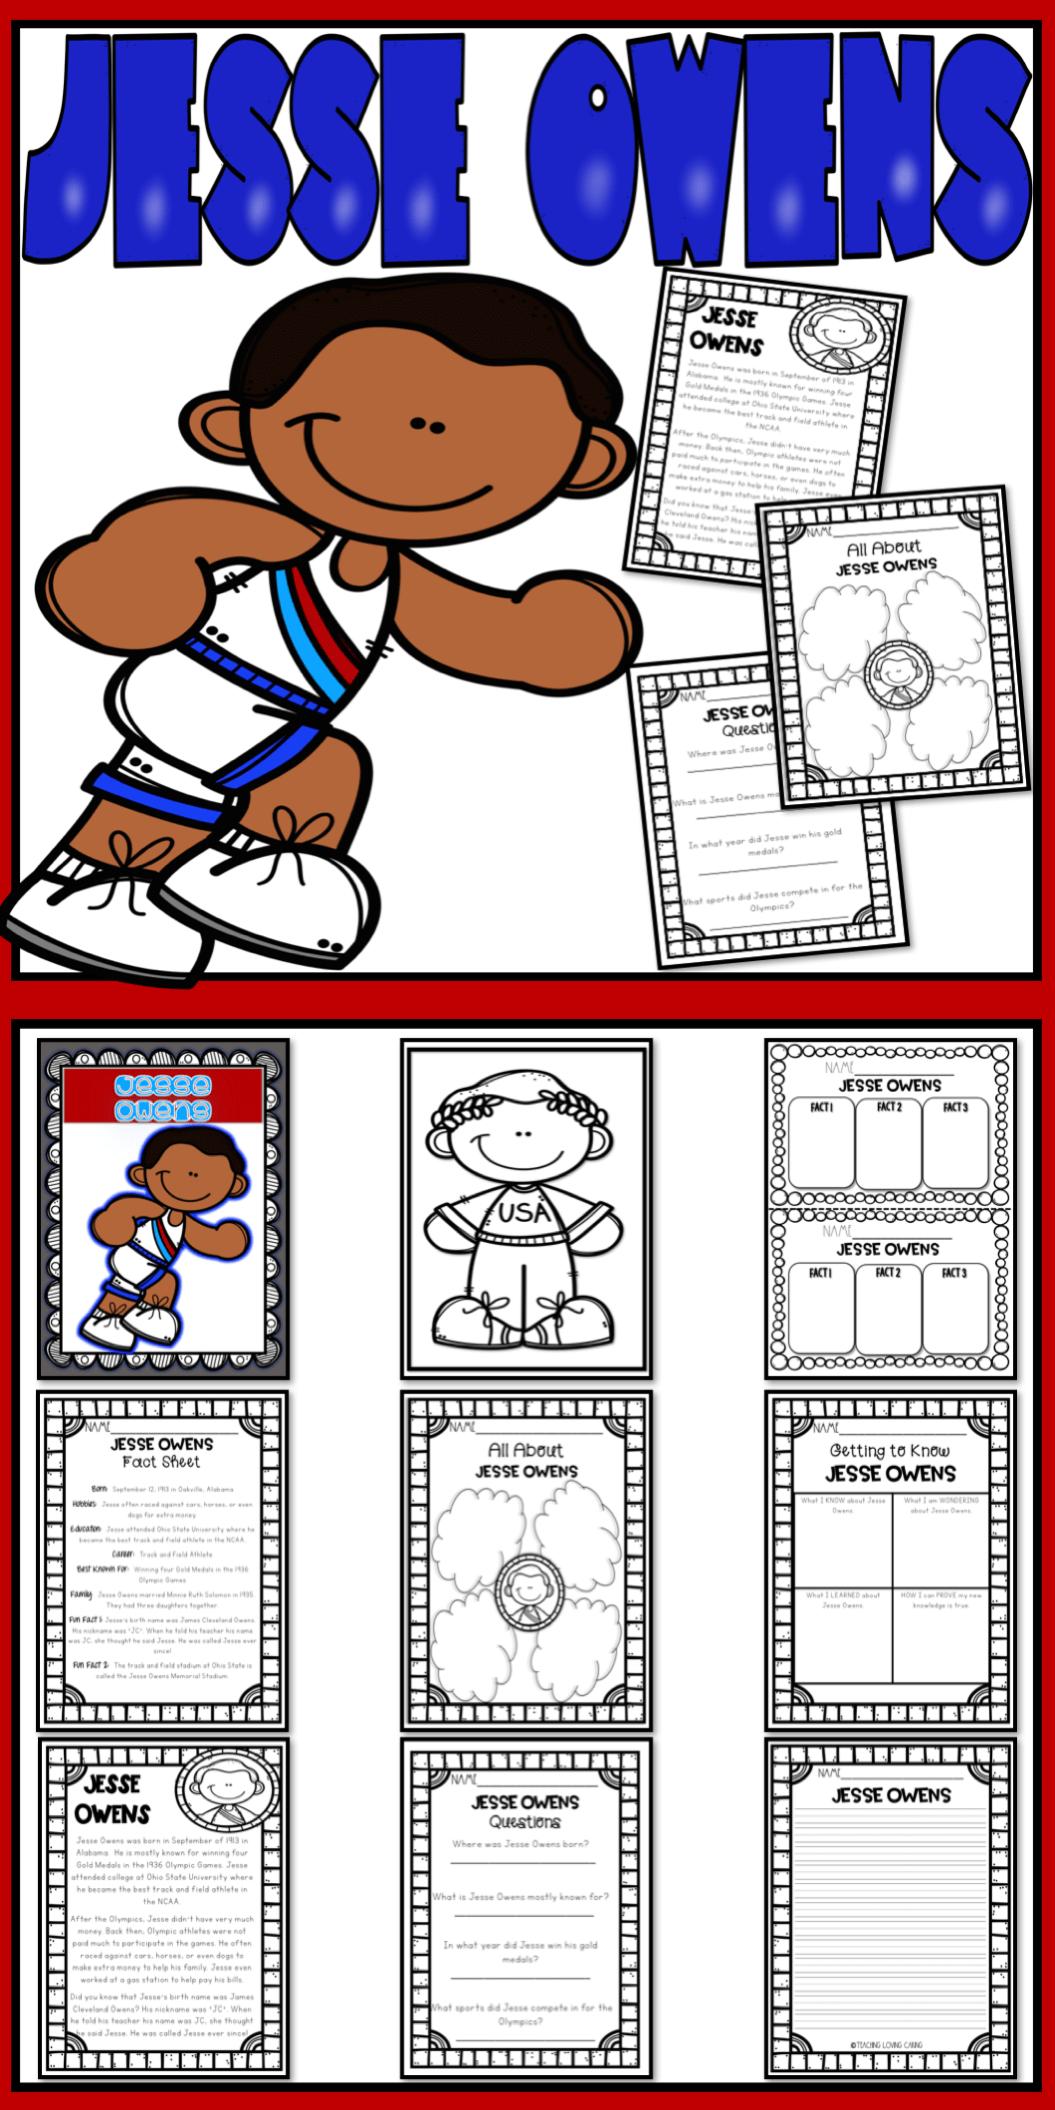 Jesse Owens Activities